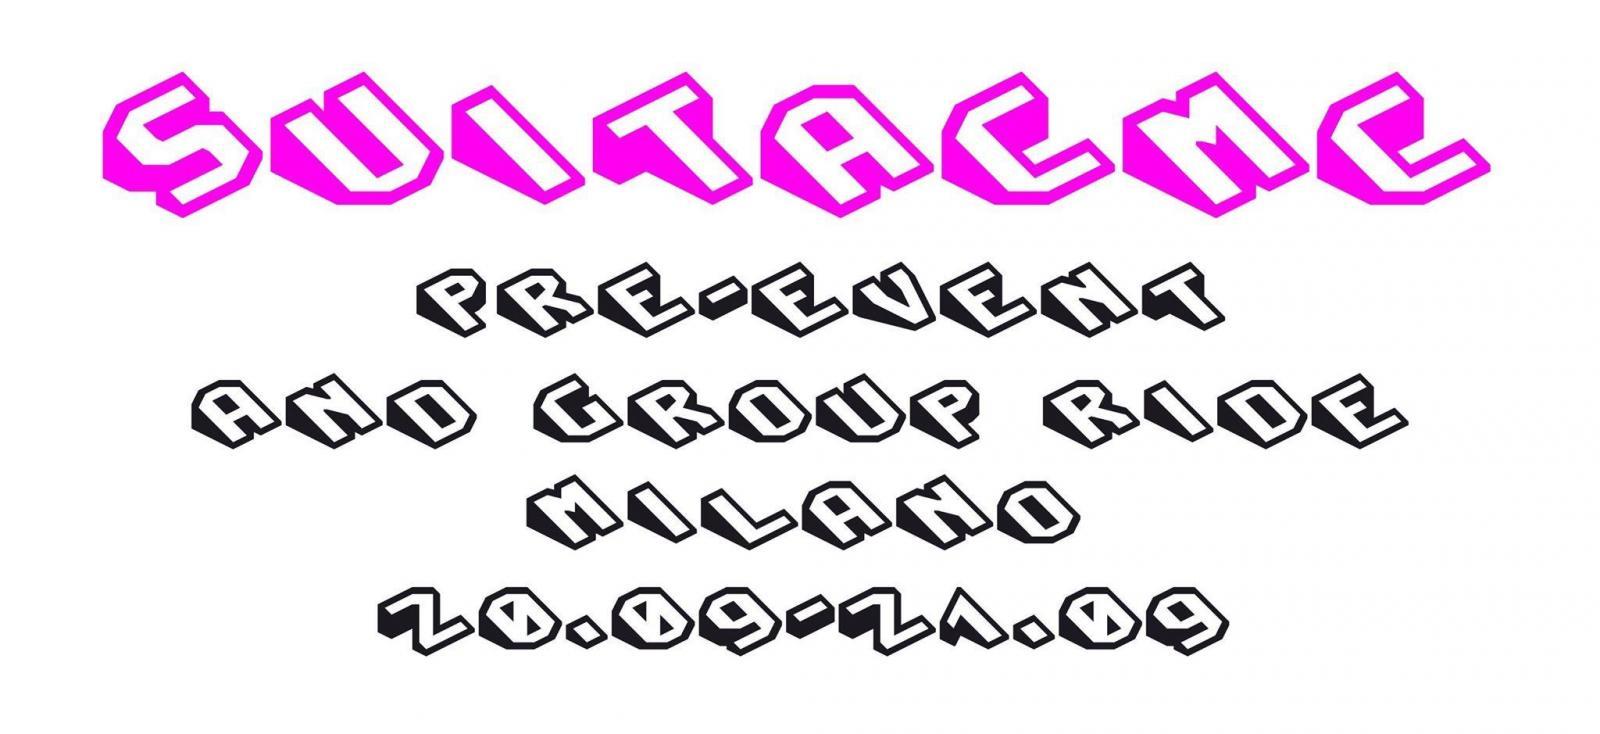 IMG_3023.thumb.JPG.8333282cfc0abe80be7e0f452f278800.JPG